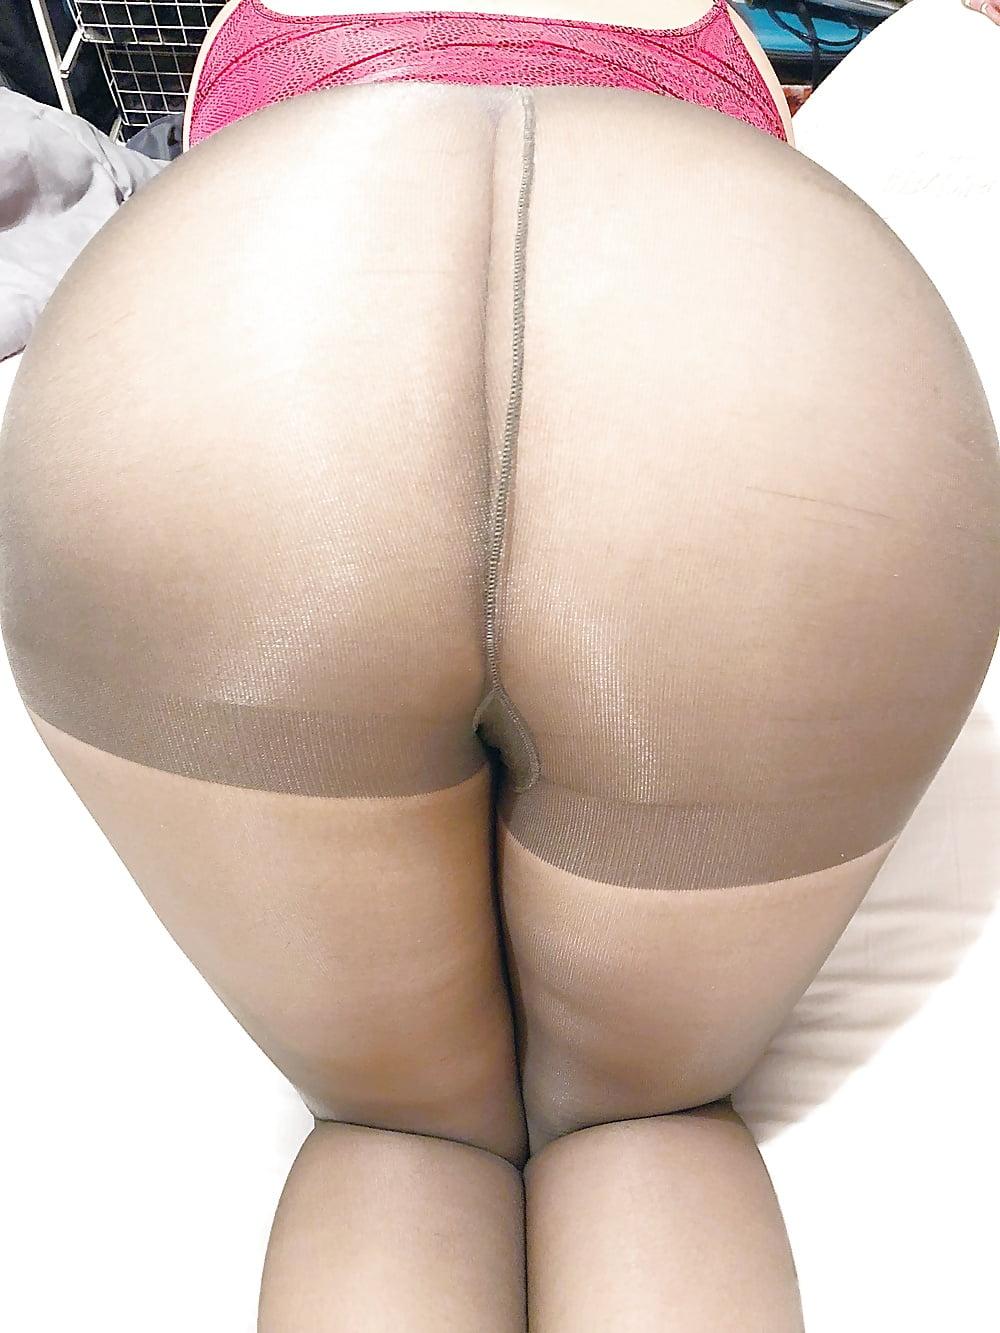 Amateur granny pantyhose pics